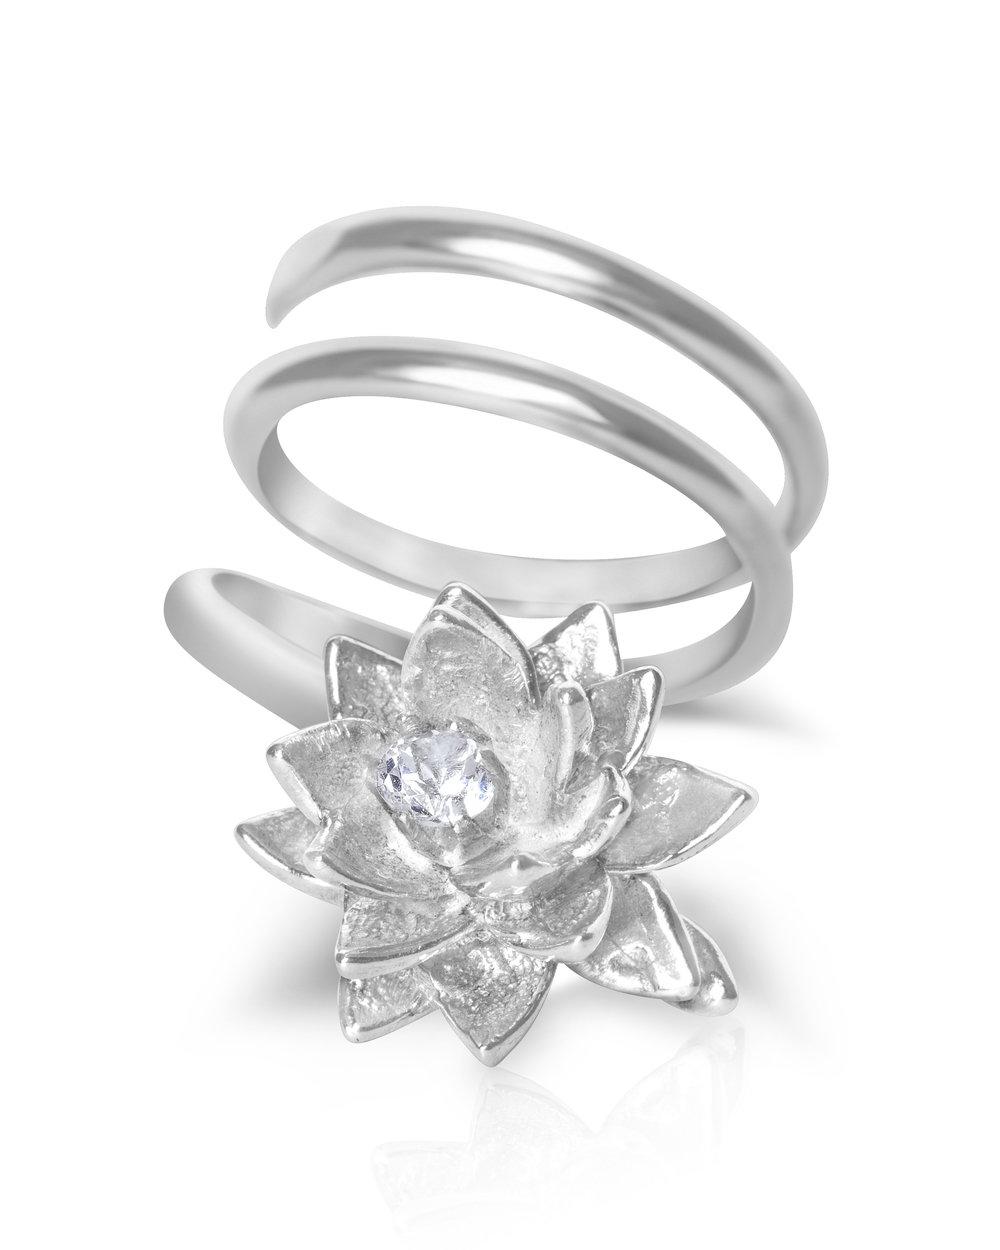 Silver Lotus Flower Ring With Gemstone